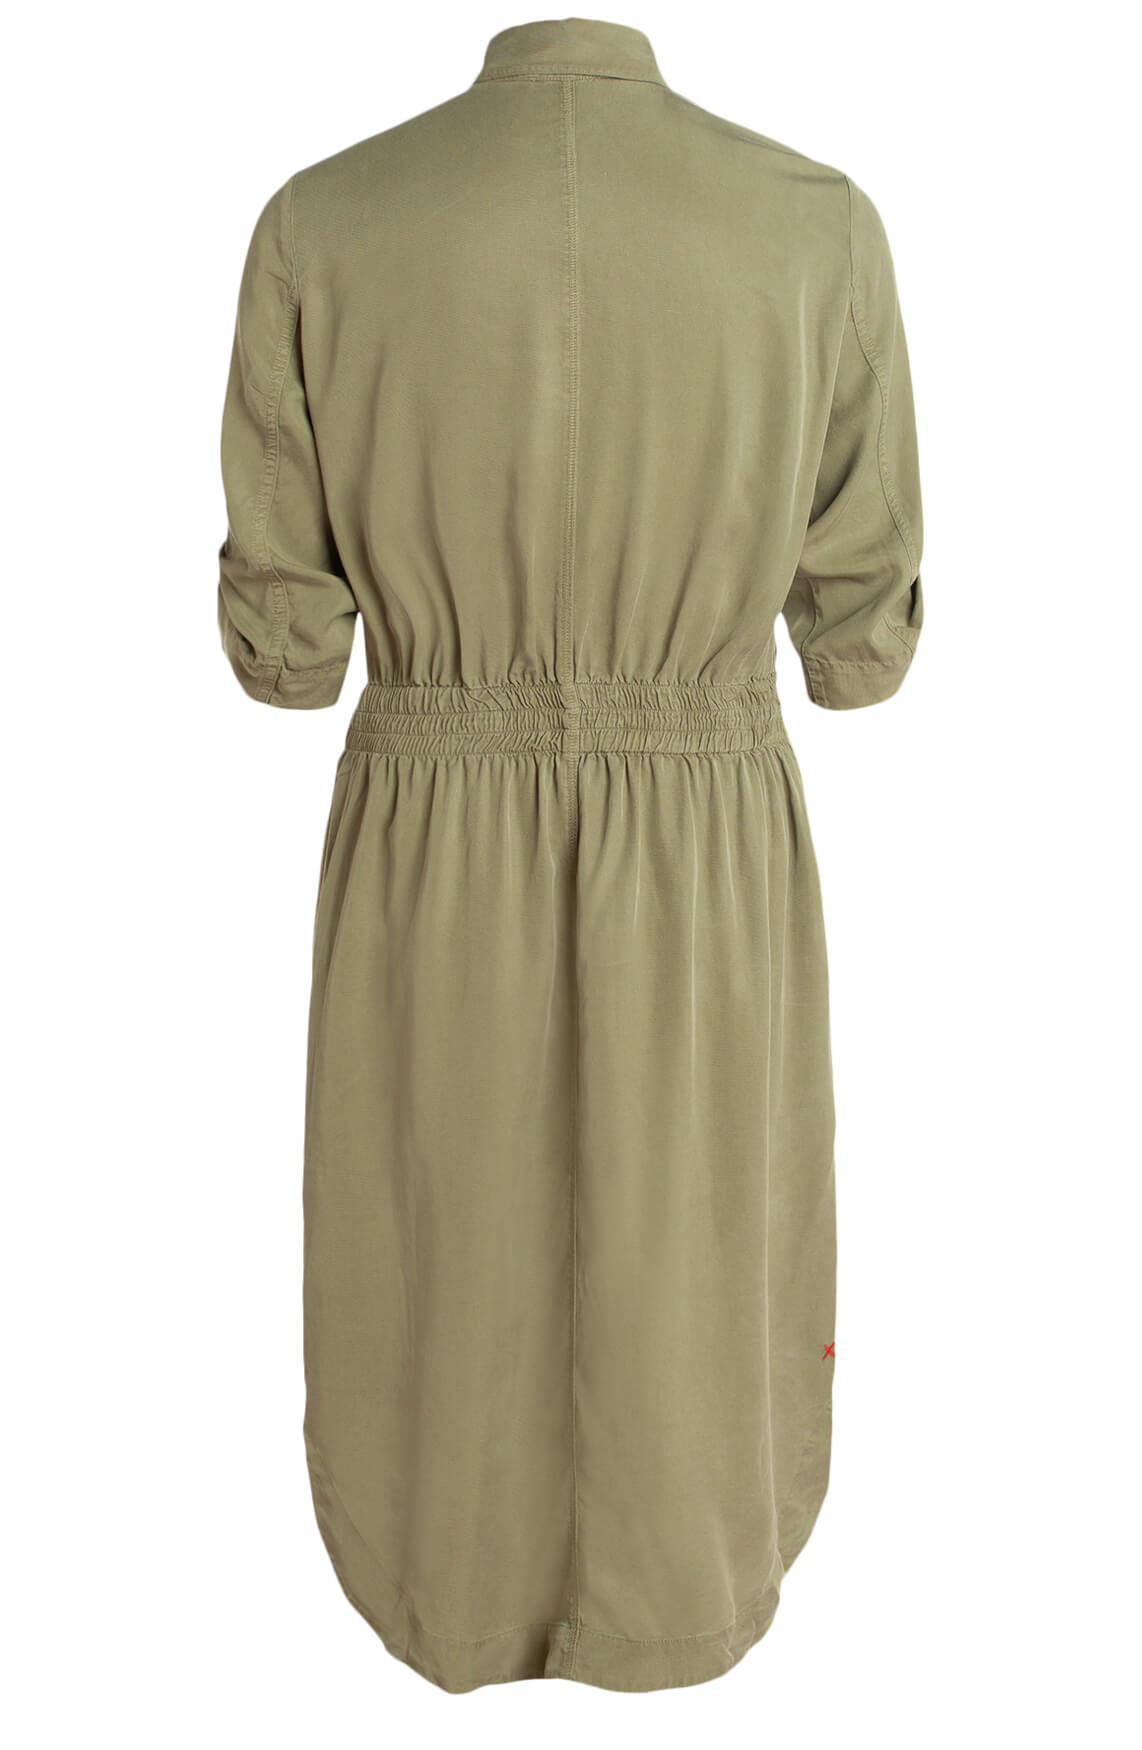 Anna Blue Dames Tencel jurk met ceintuur groen